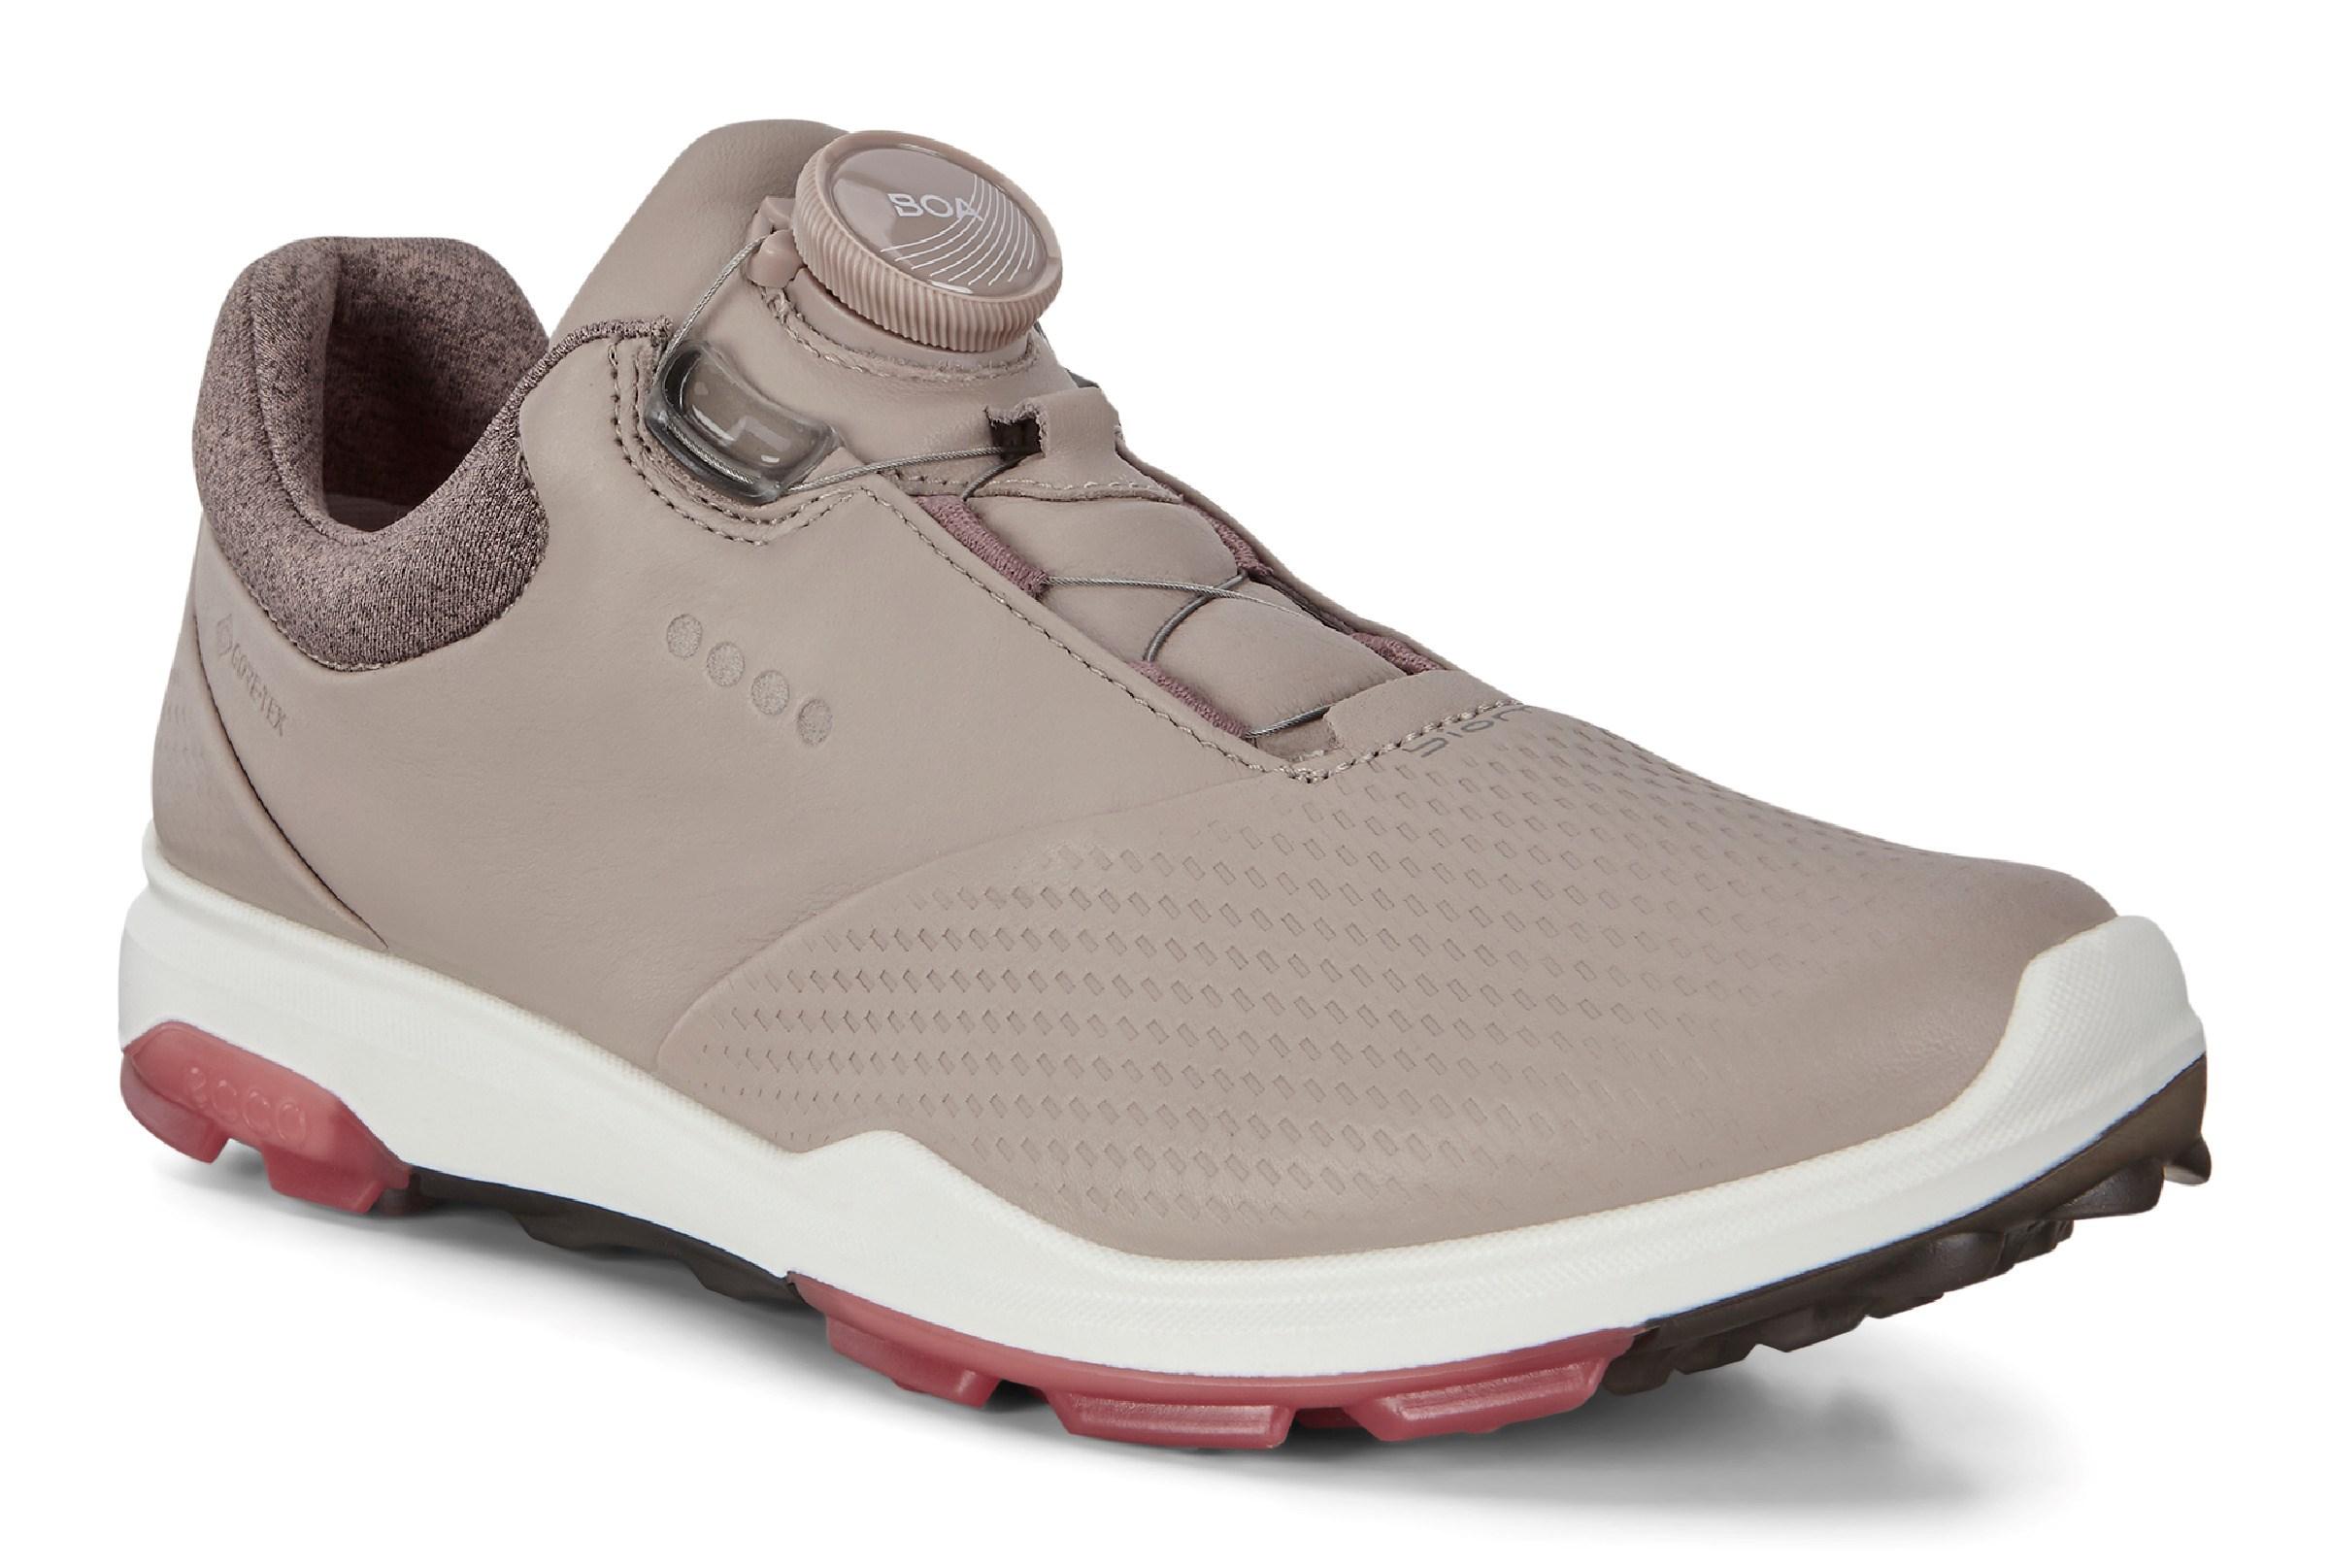 ecco boots shoes online, Men Running Shoes ecco BIOM LITE